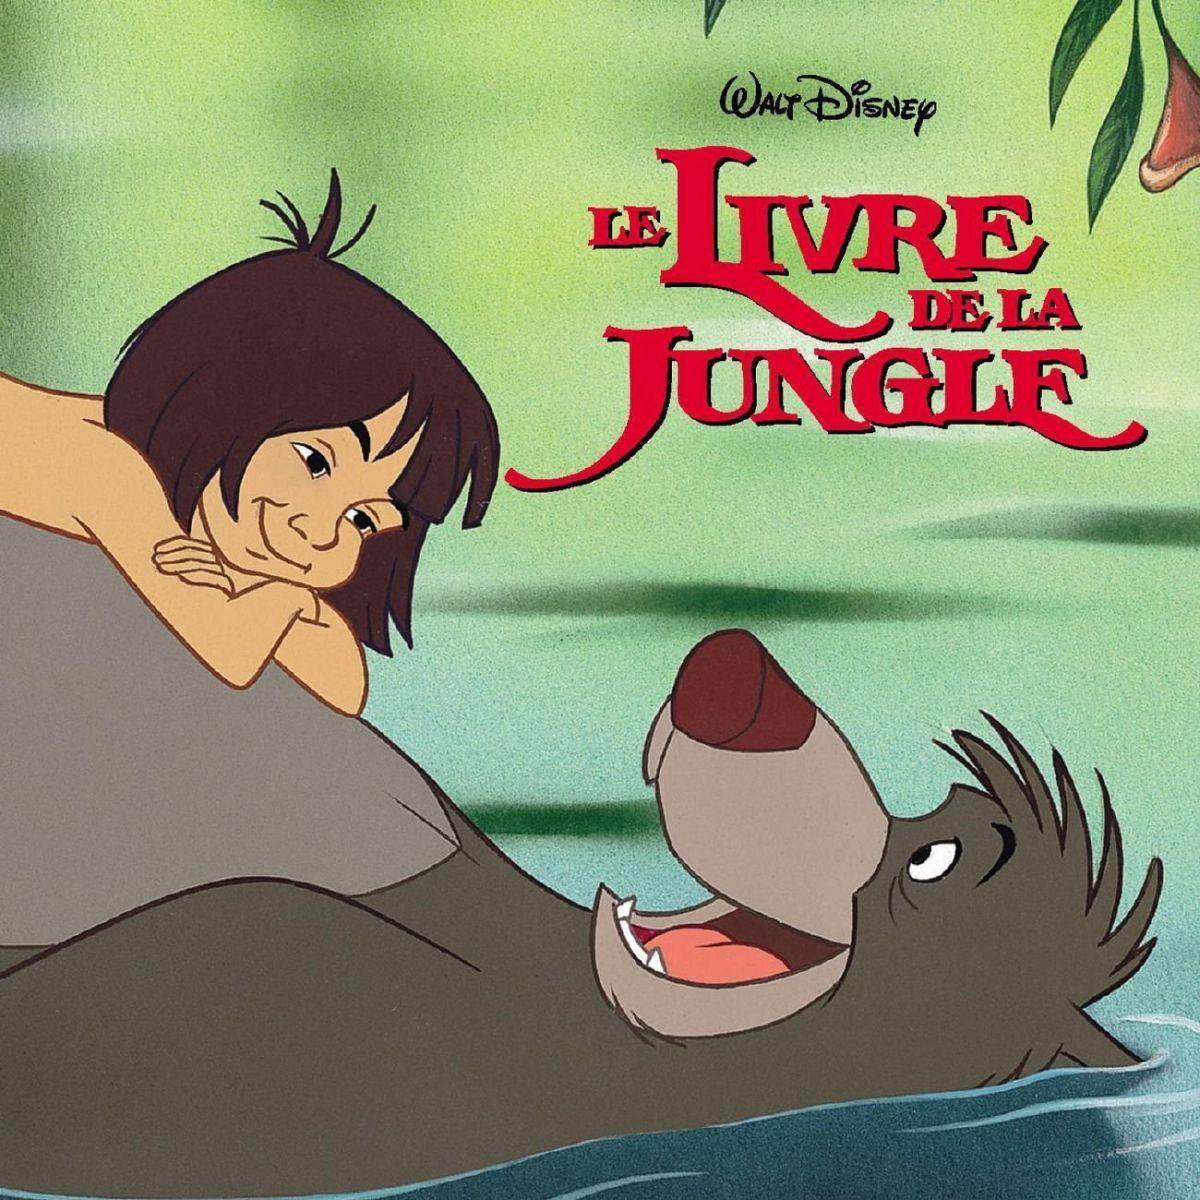 BO, le livre de la jungle, 6.11-LIV